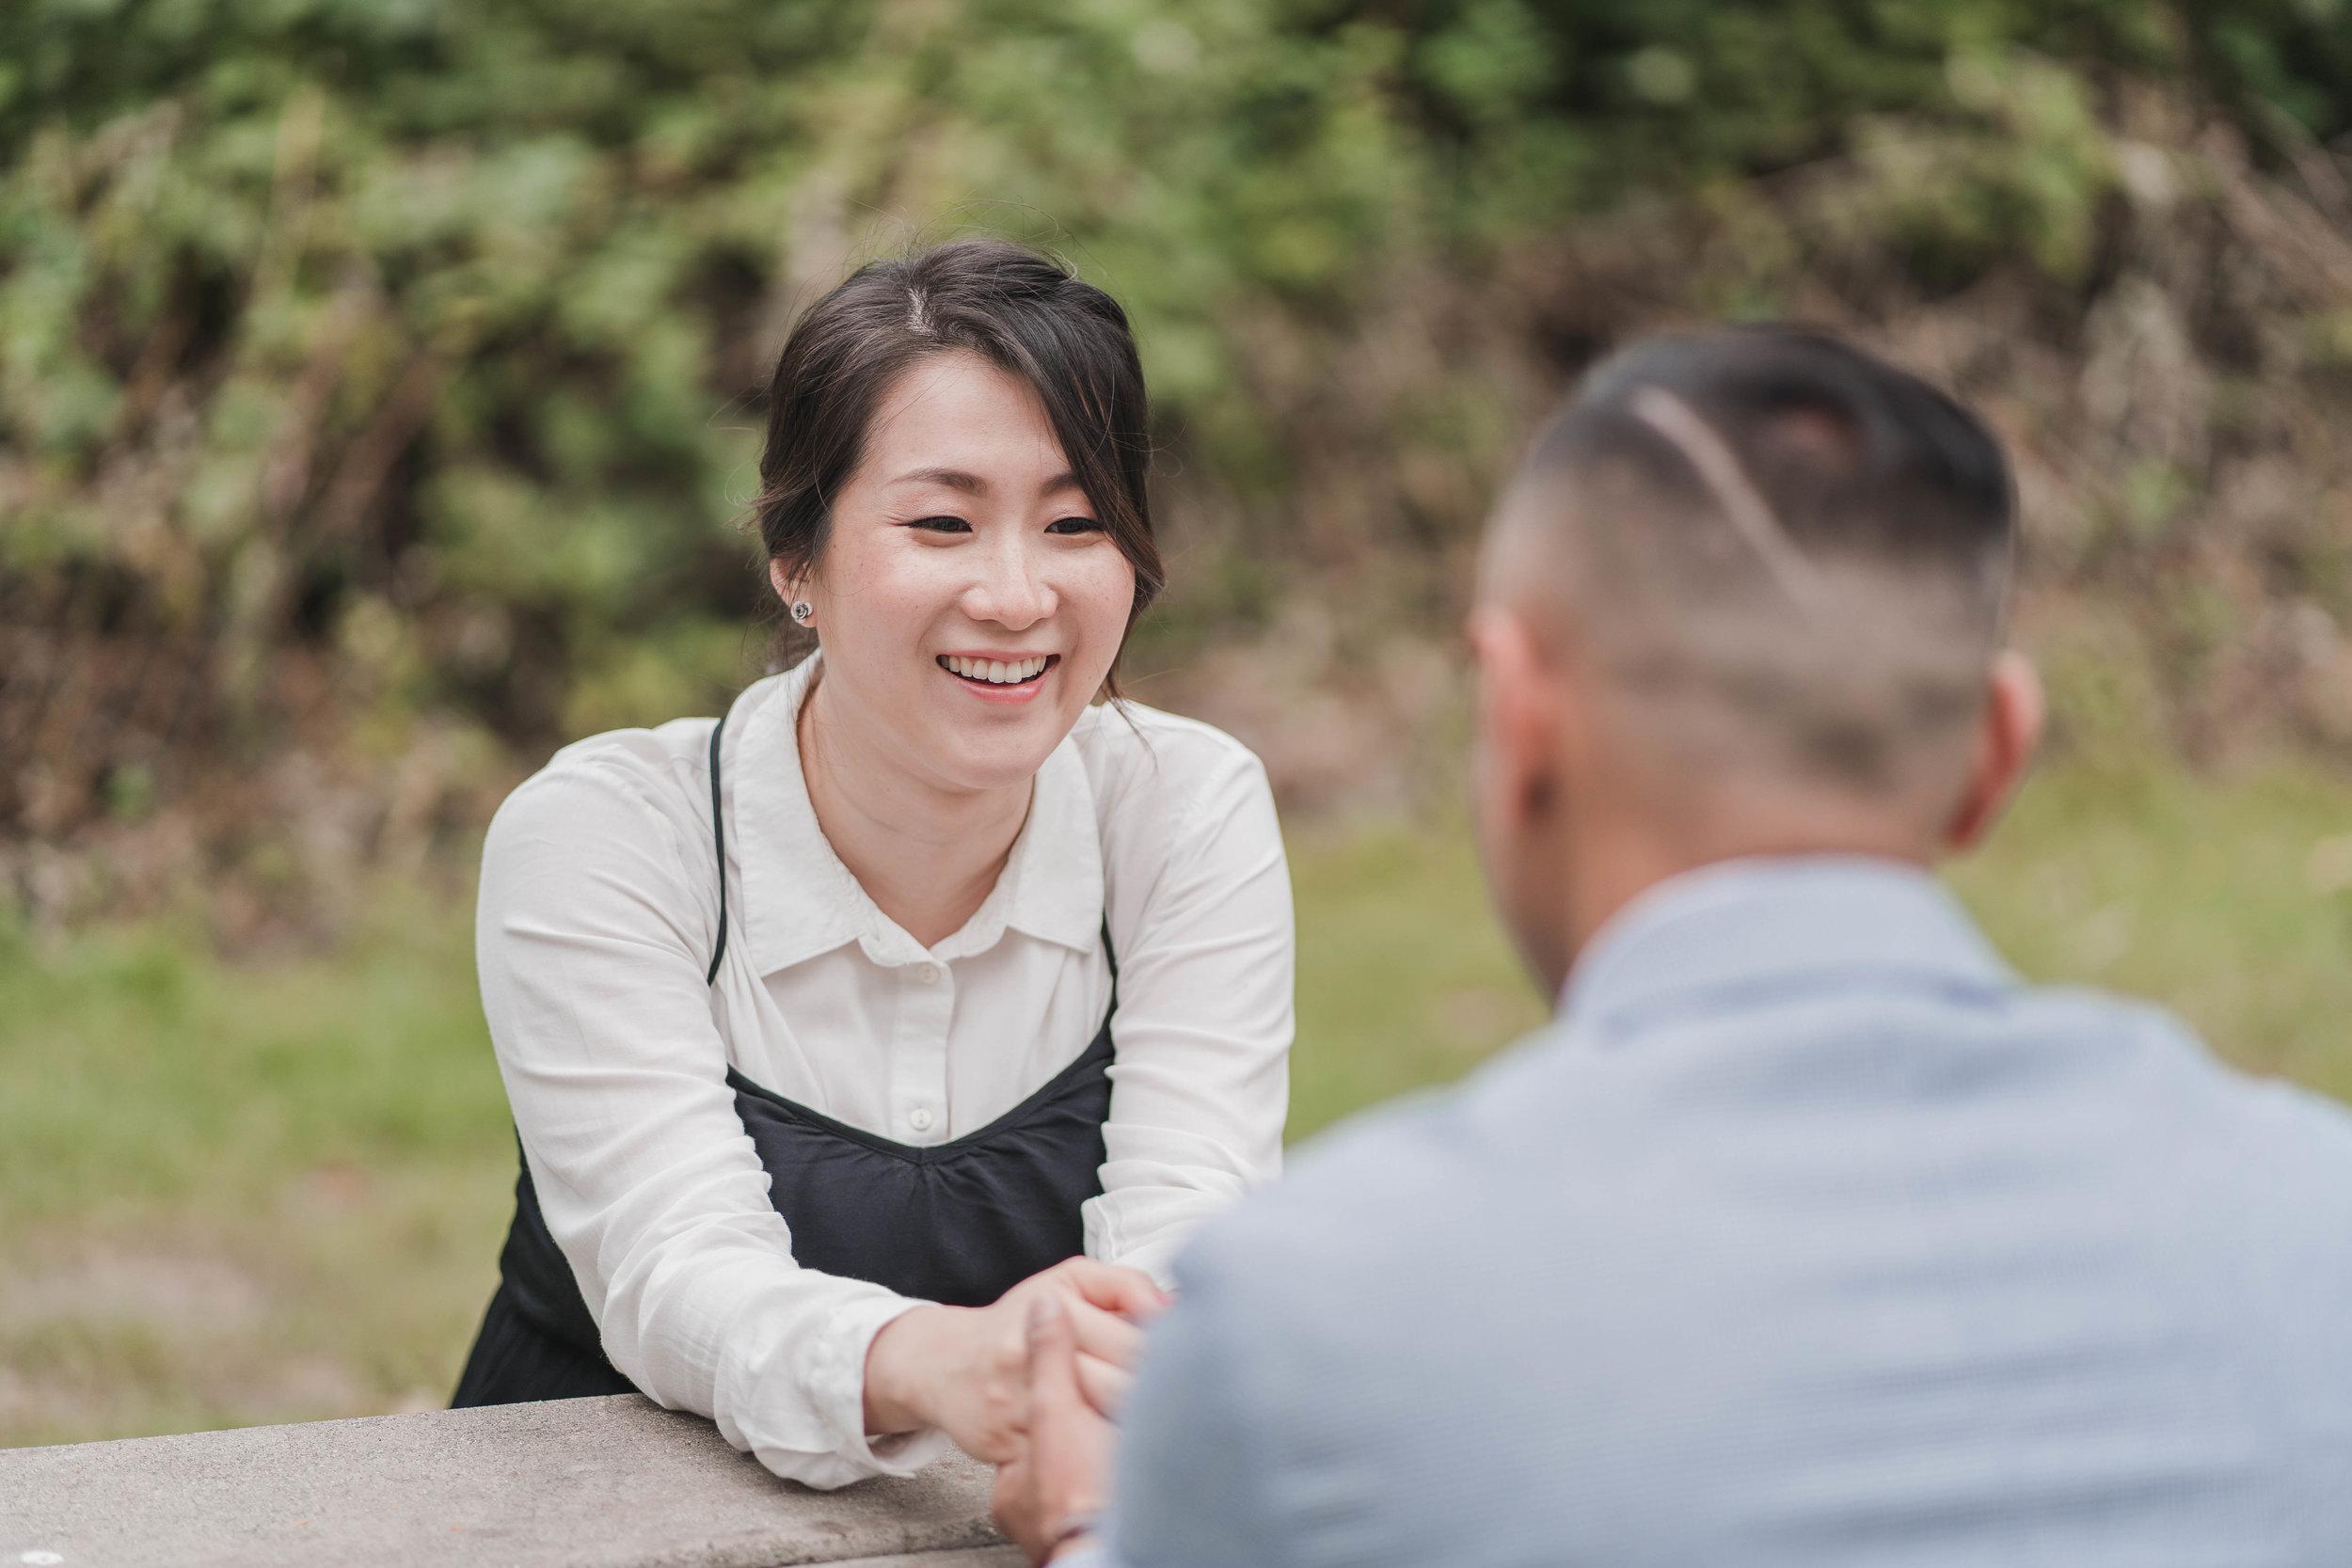 20190622 - Monika & Johnson Engagement - 0163.jpg